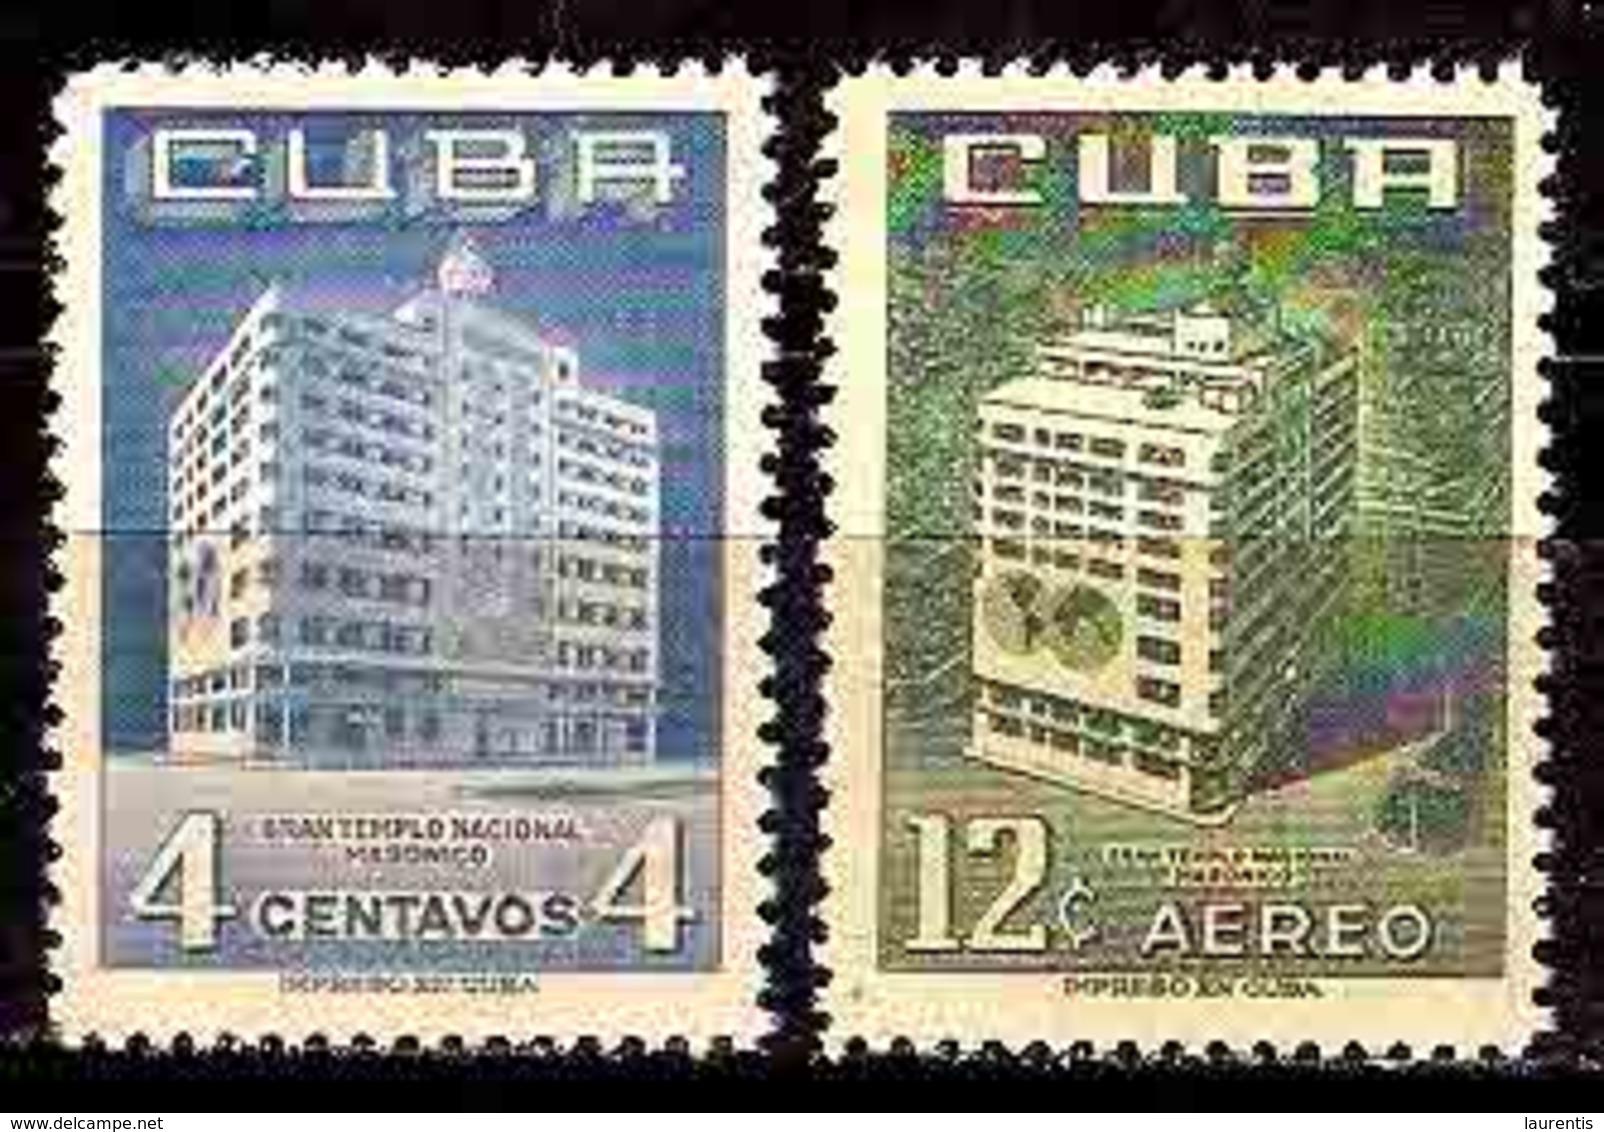 645  Franc-Maconnerie - Yv 440 + A - MNH - Cb -  2,75 - Franc-Maçonnerie